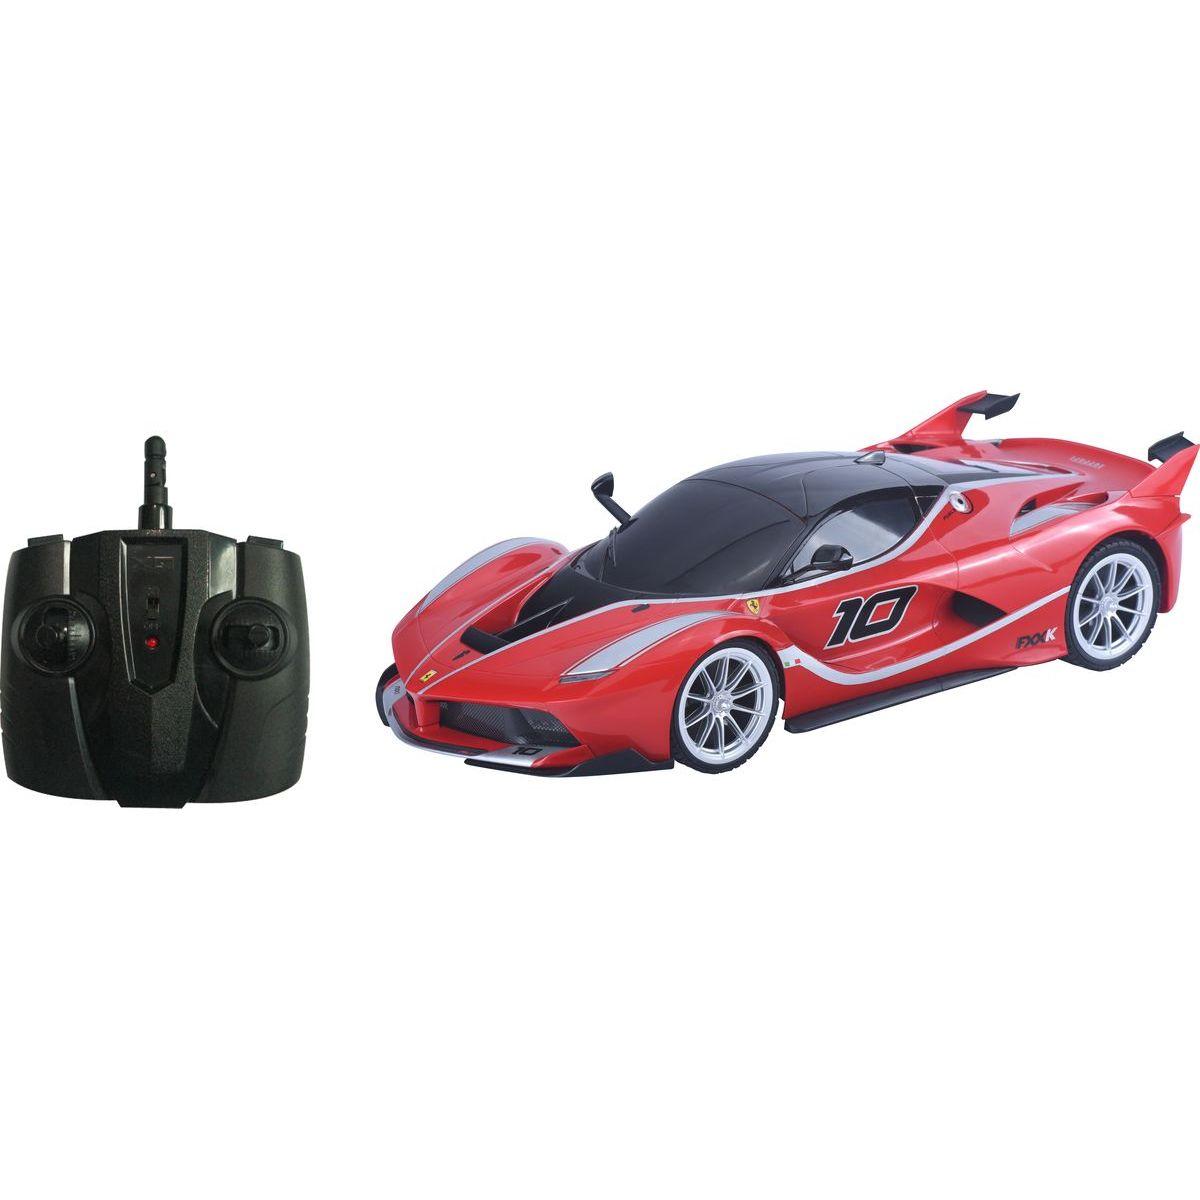 Ep line Závodné RC auto Ferrari laferrari FXXK 1:24